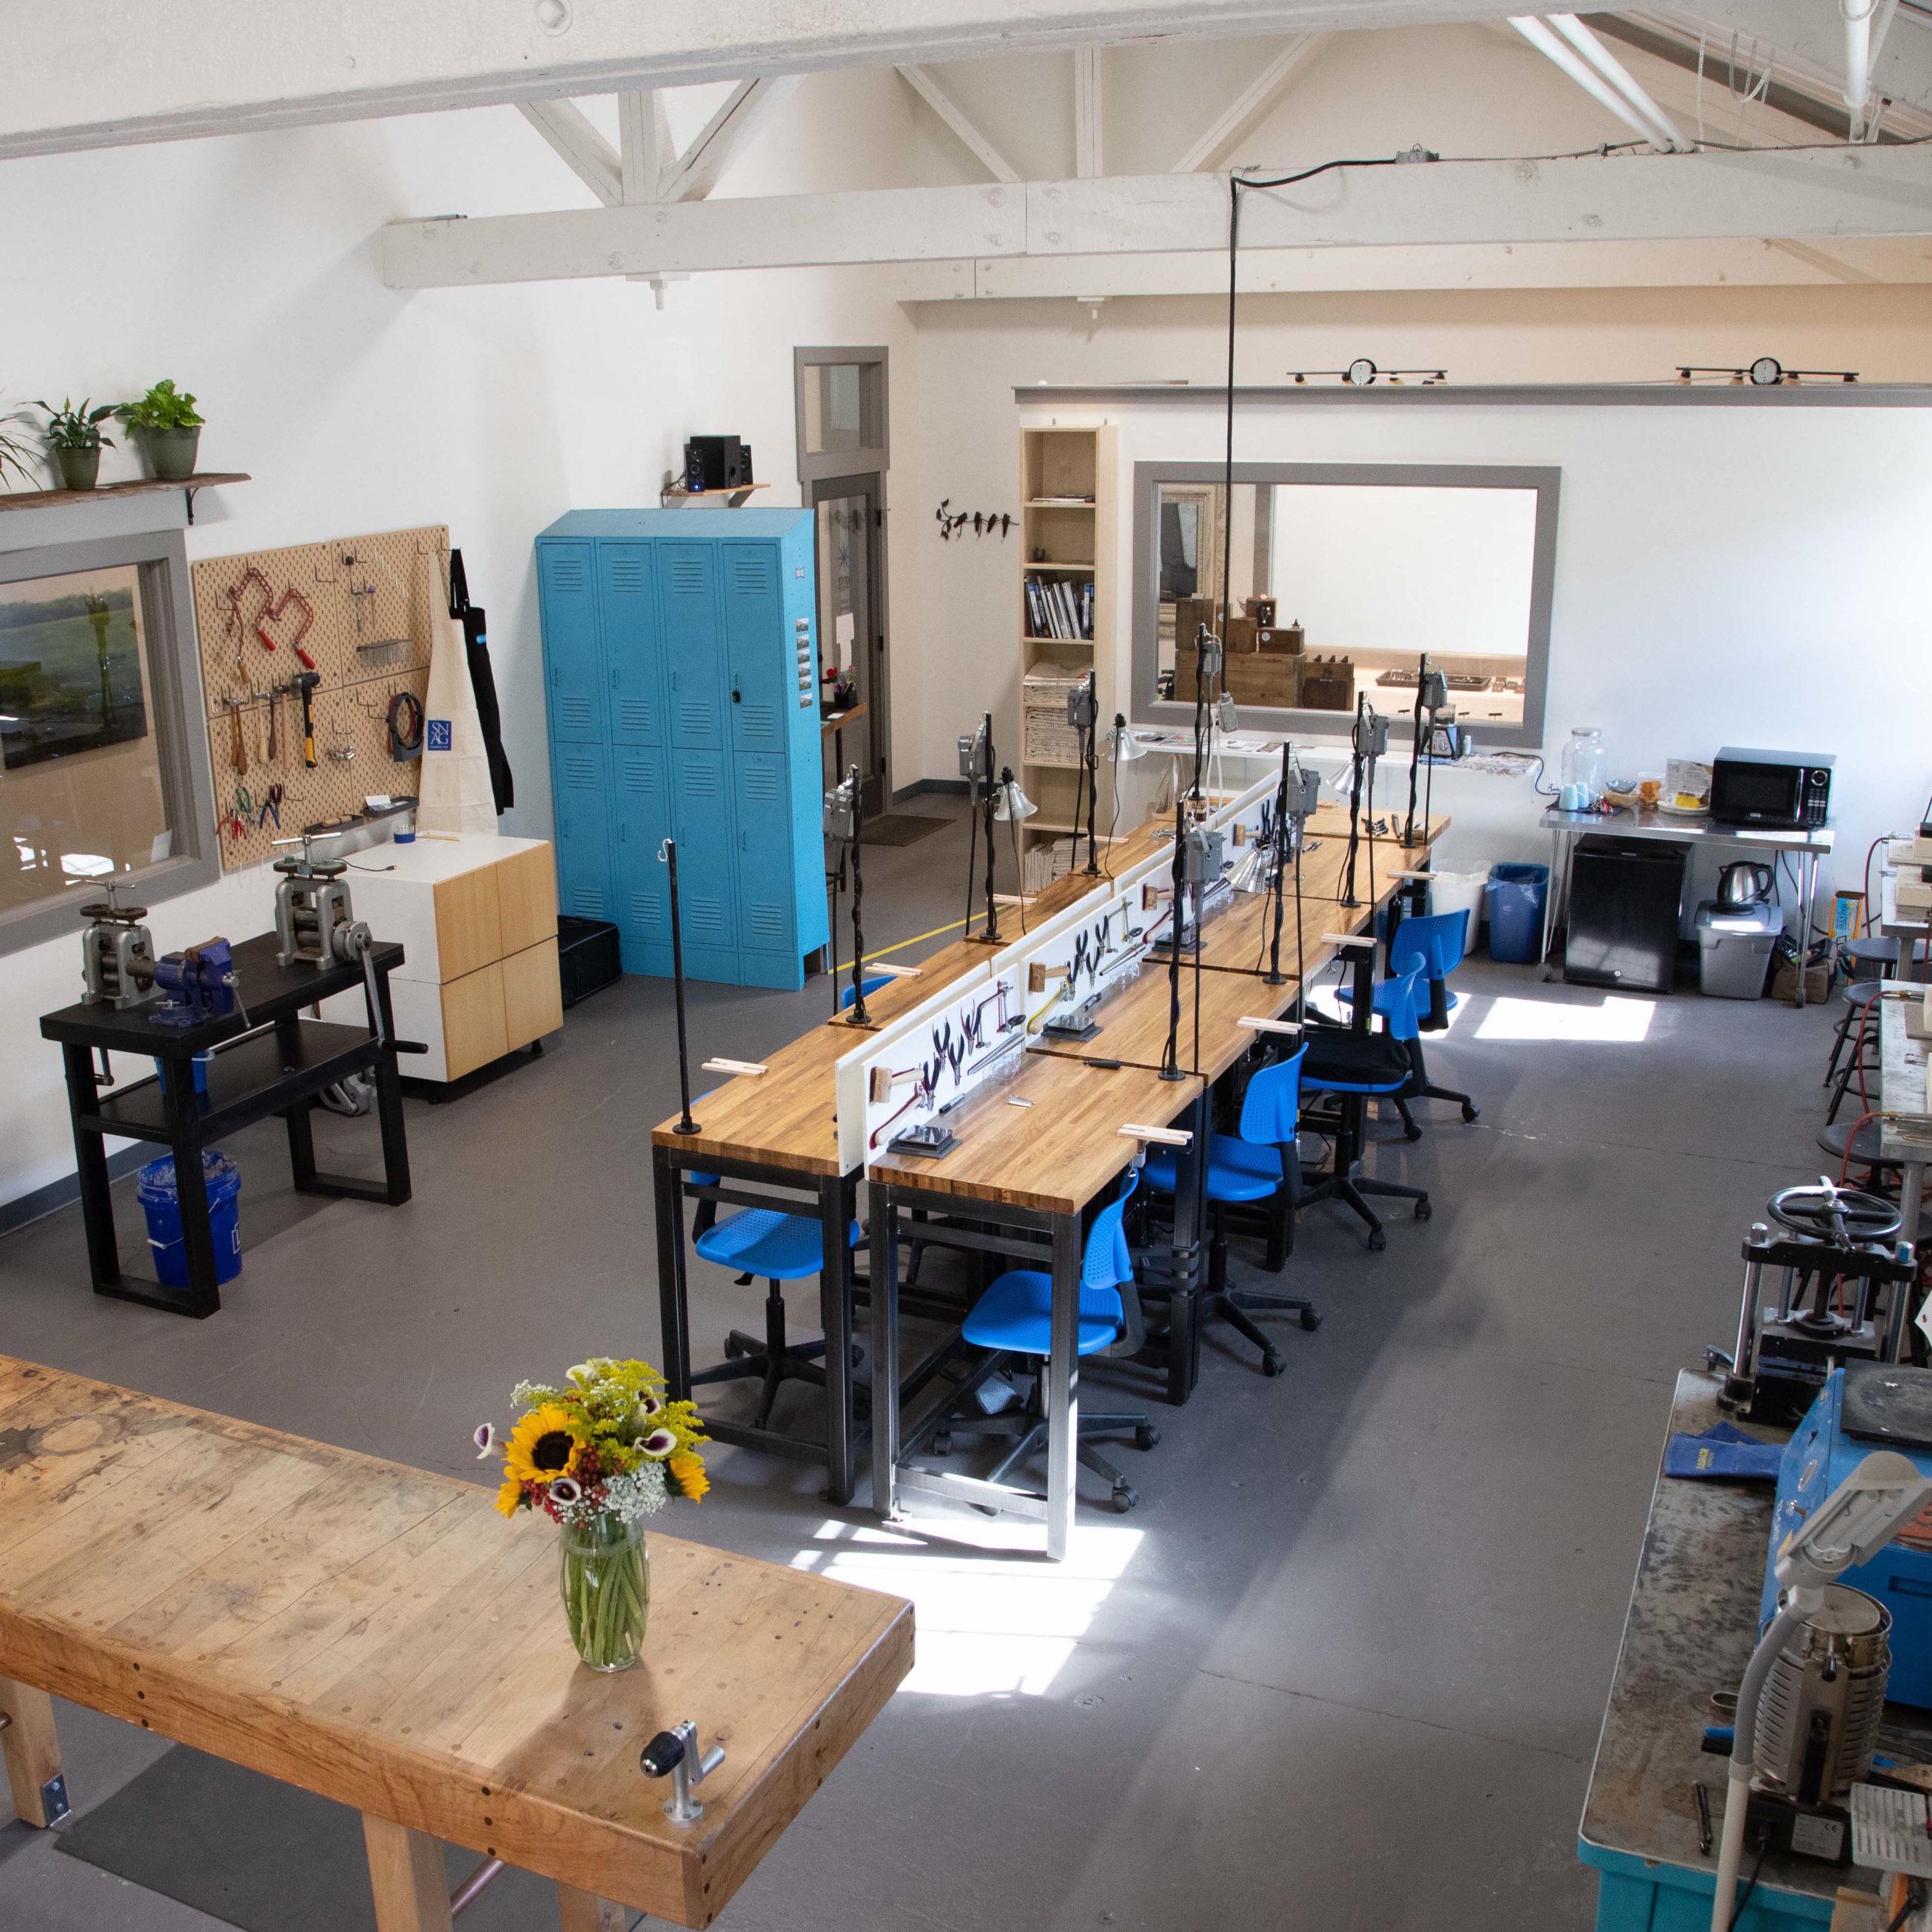 Asheville-jewelry-class-workshop-Ignite-studios-square